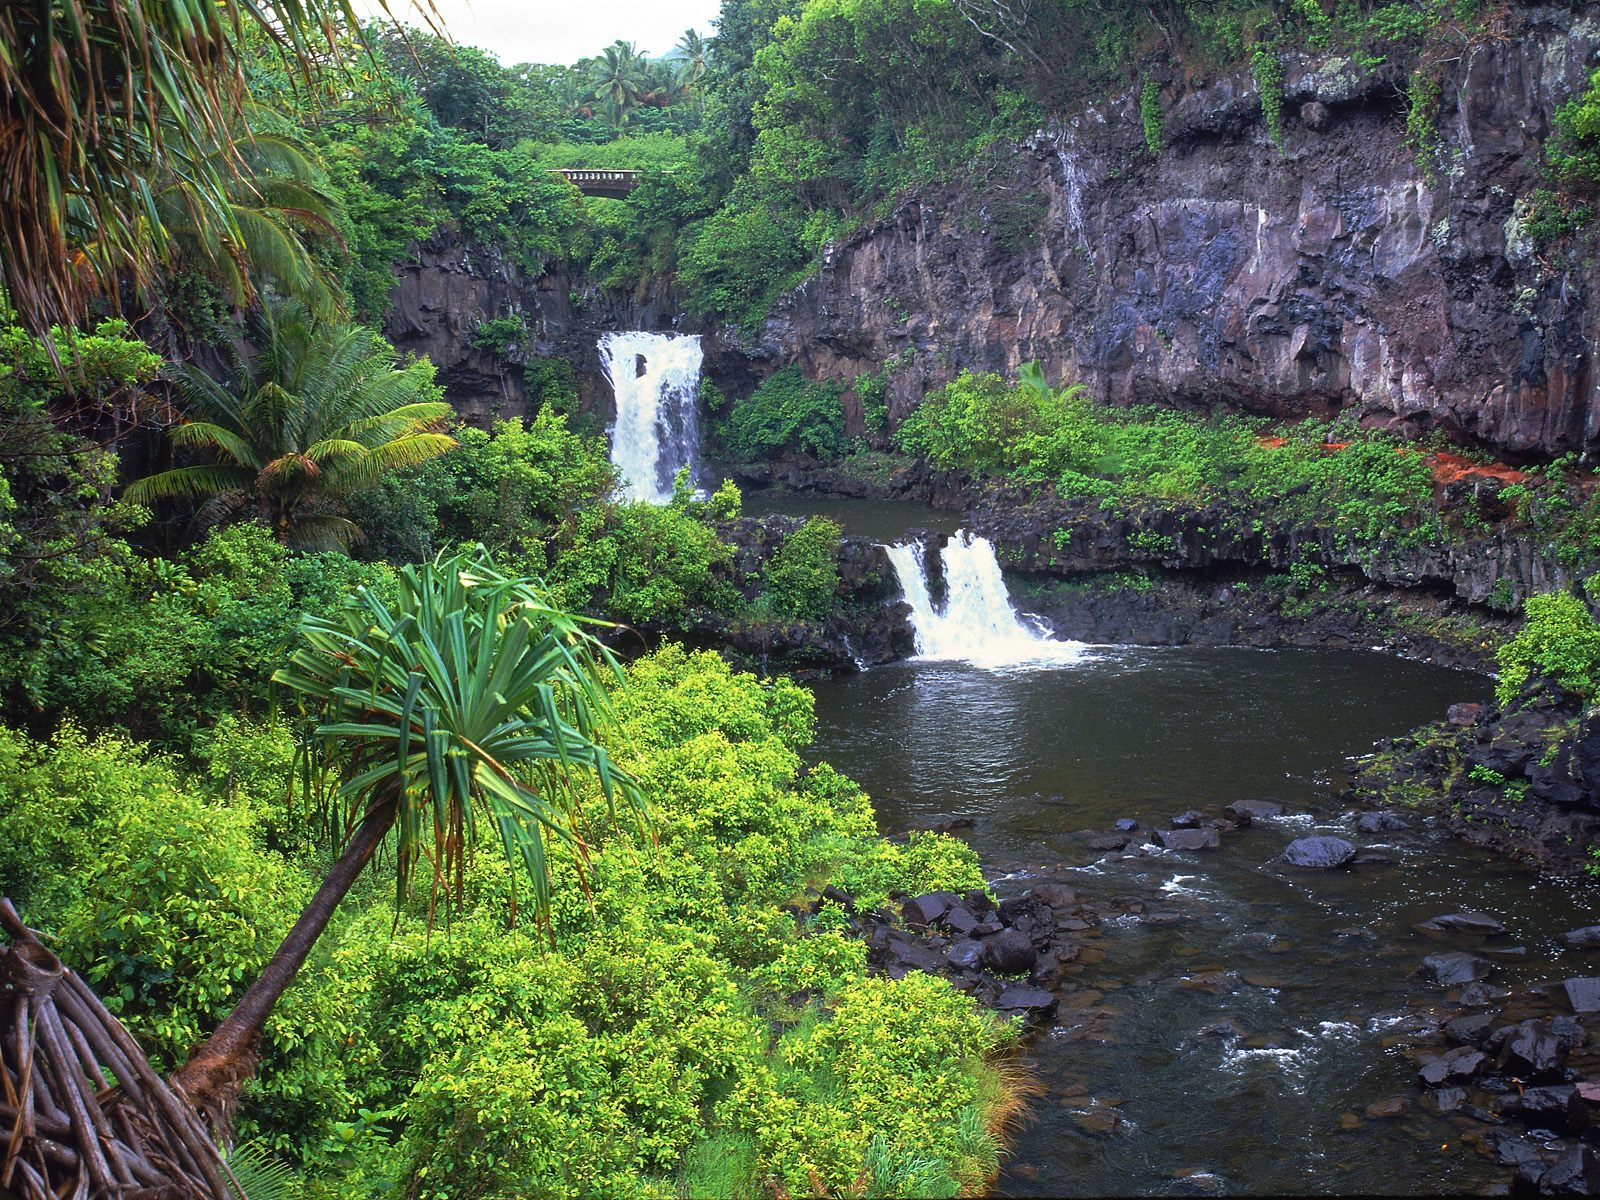 Trip Report - First Time Visit to Hawaii (Kauai portion) - Kauai Forum